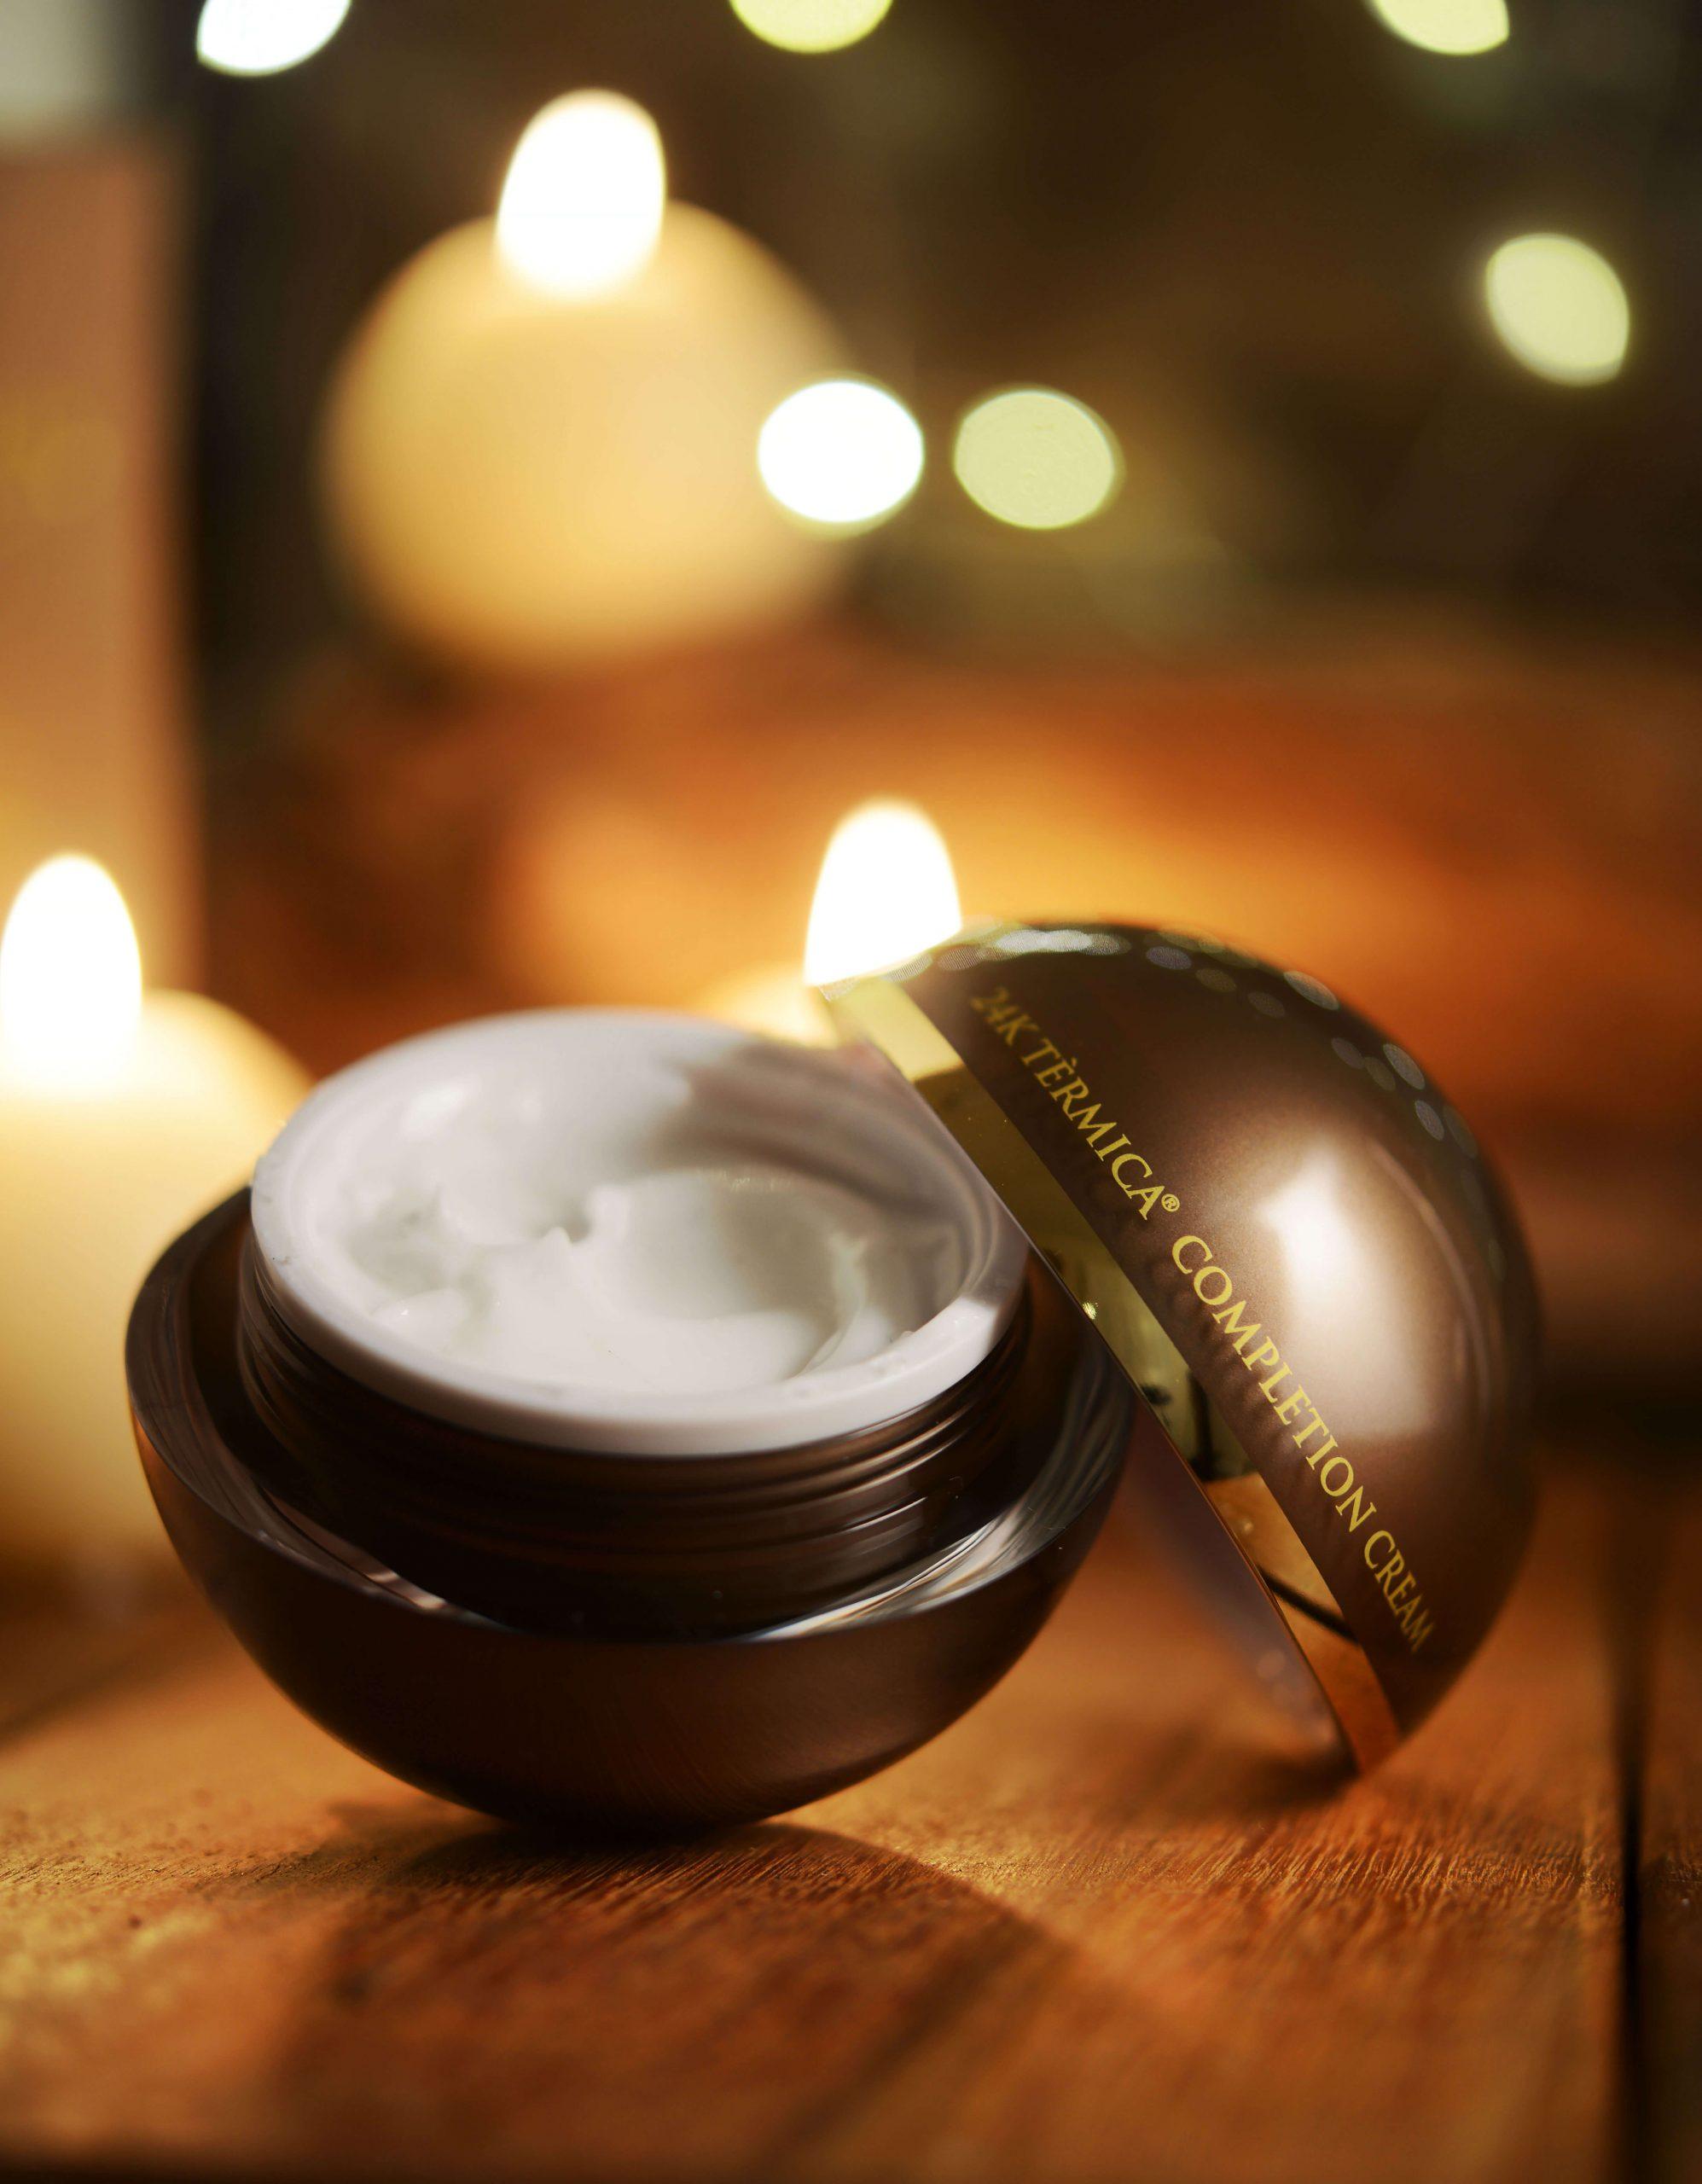 24K Completion Cream